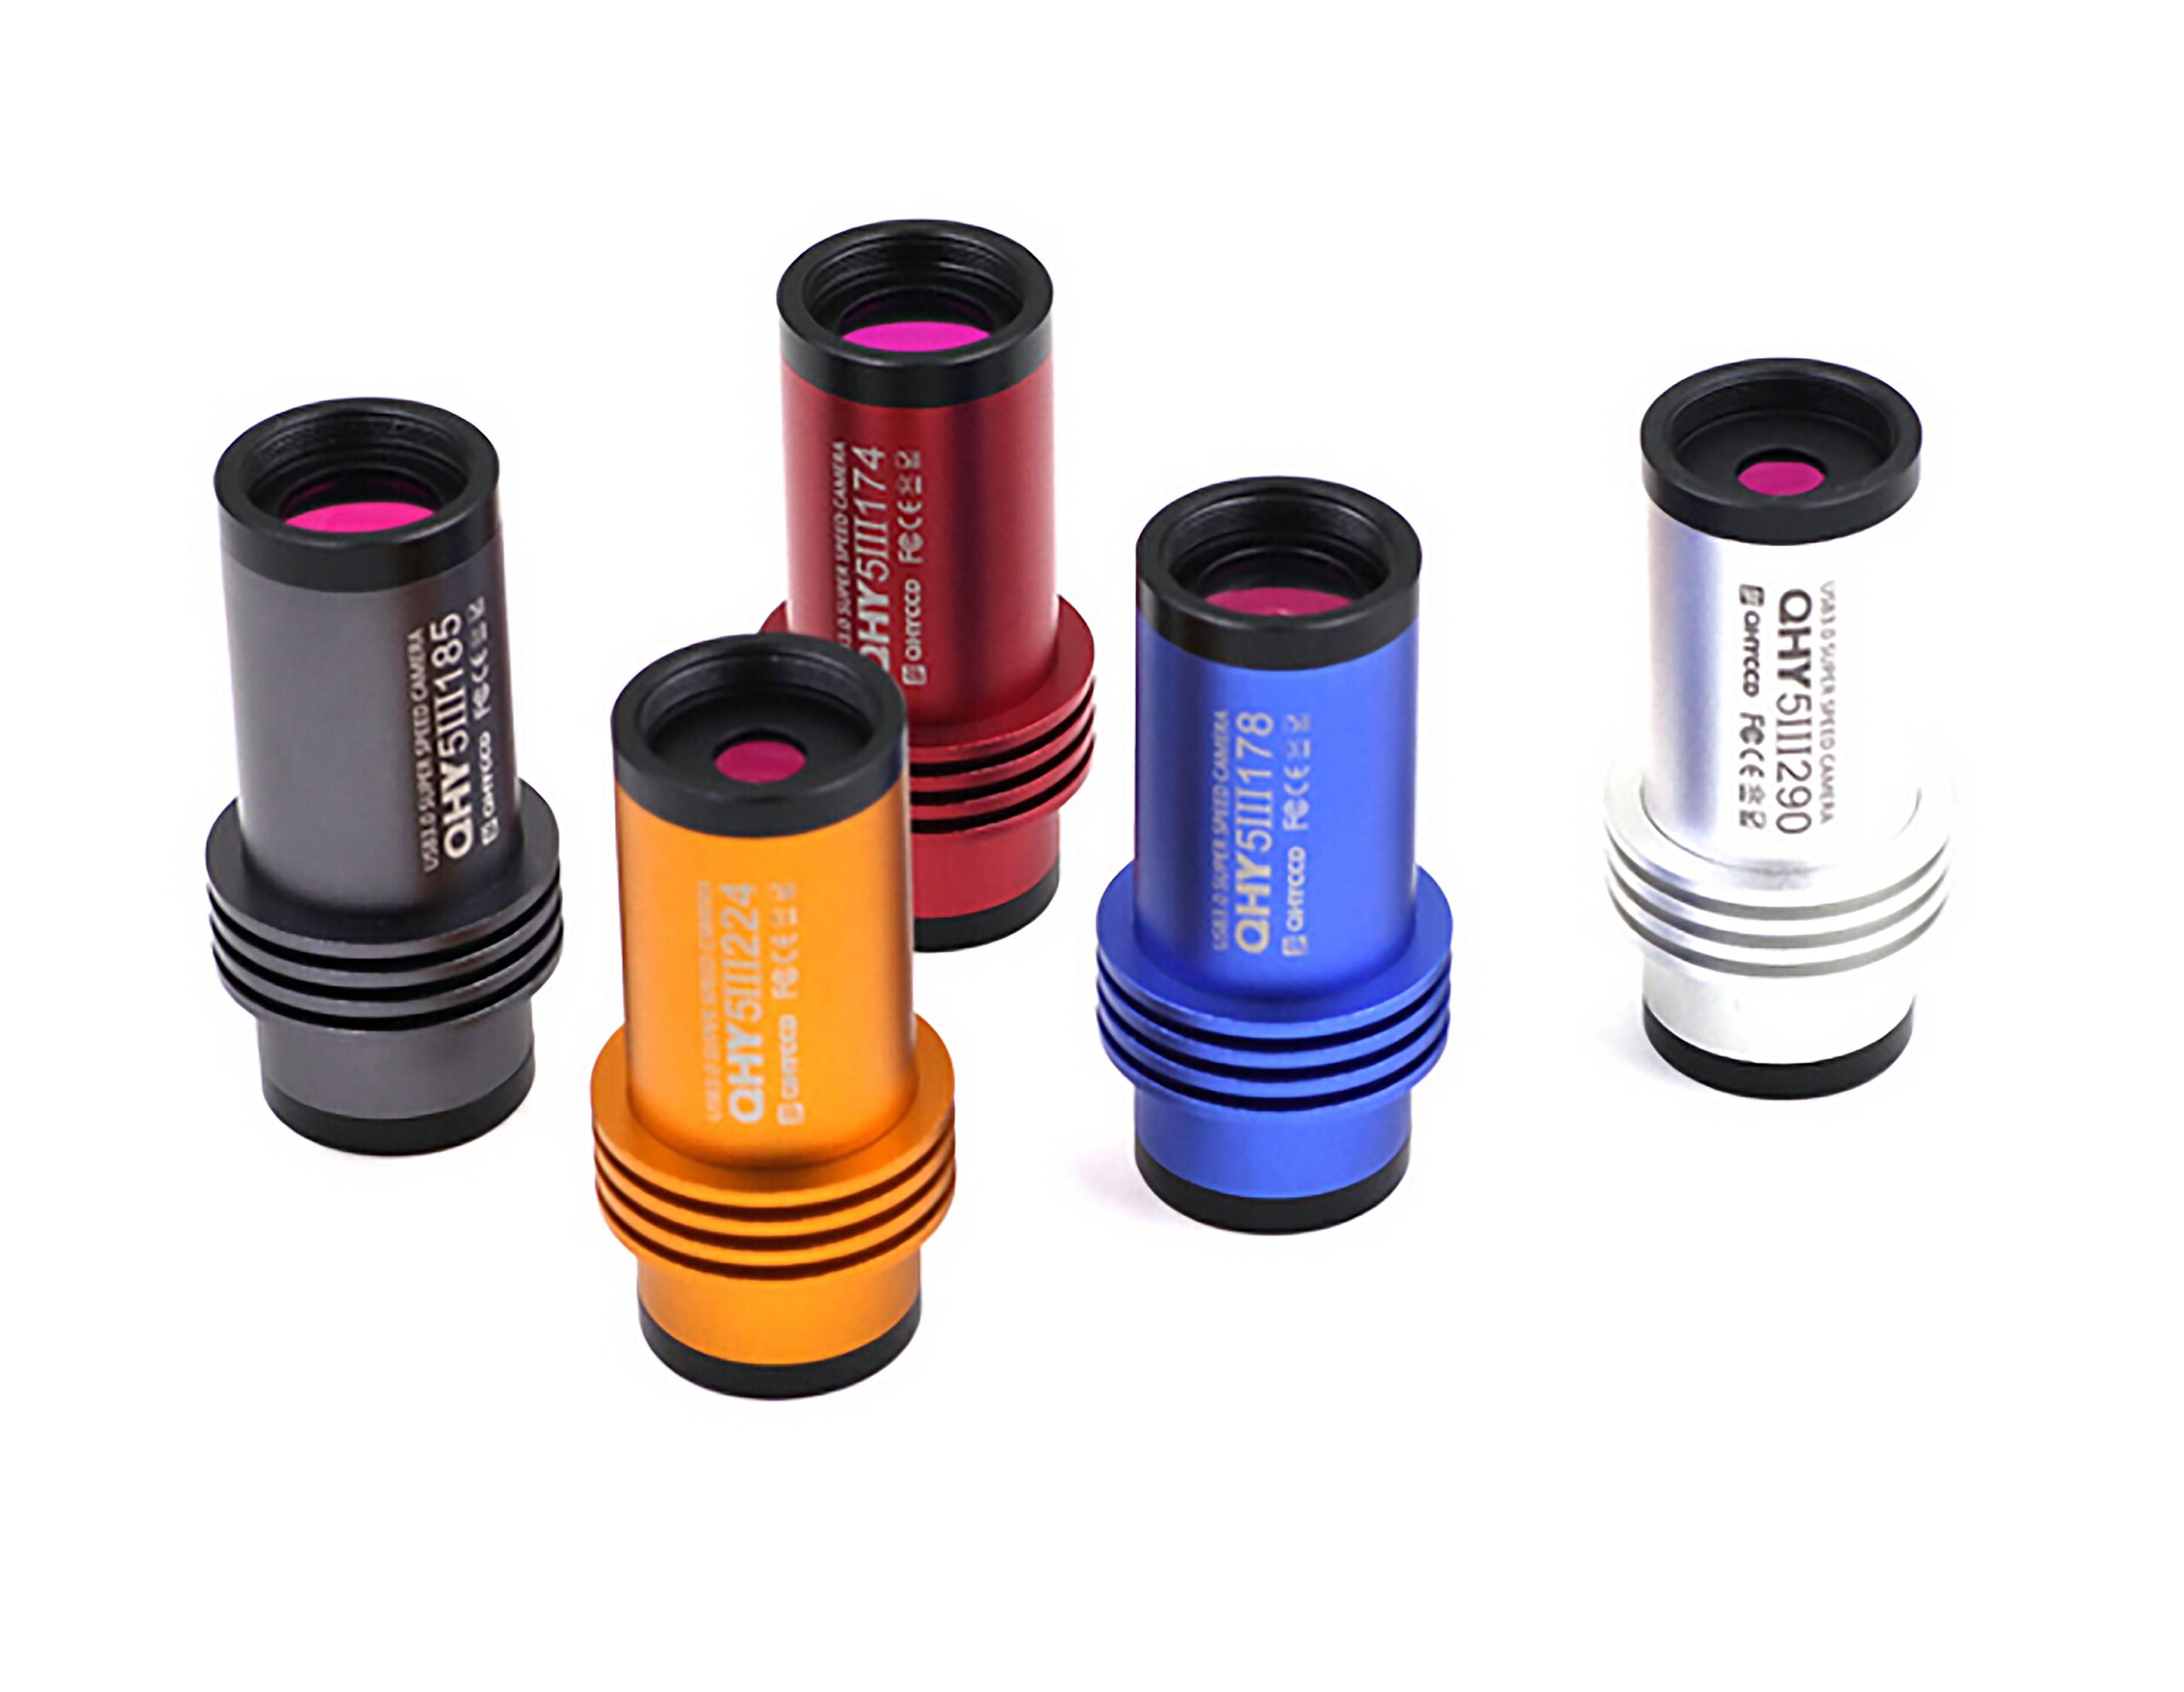 QHY 5-III Serie USB 3.0 Guiding und Planetenkameras